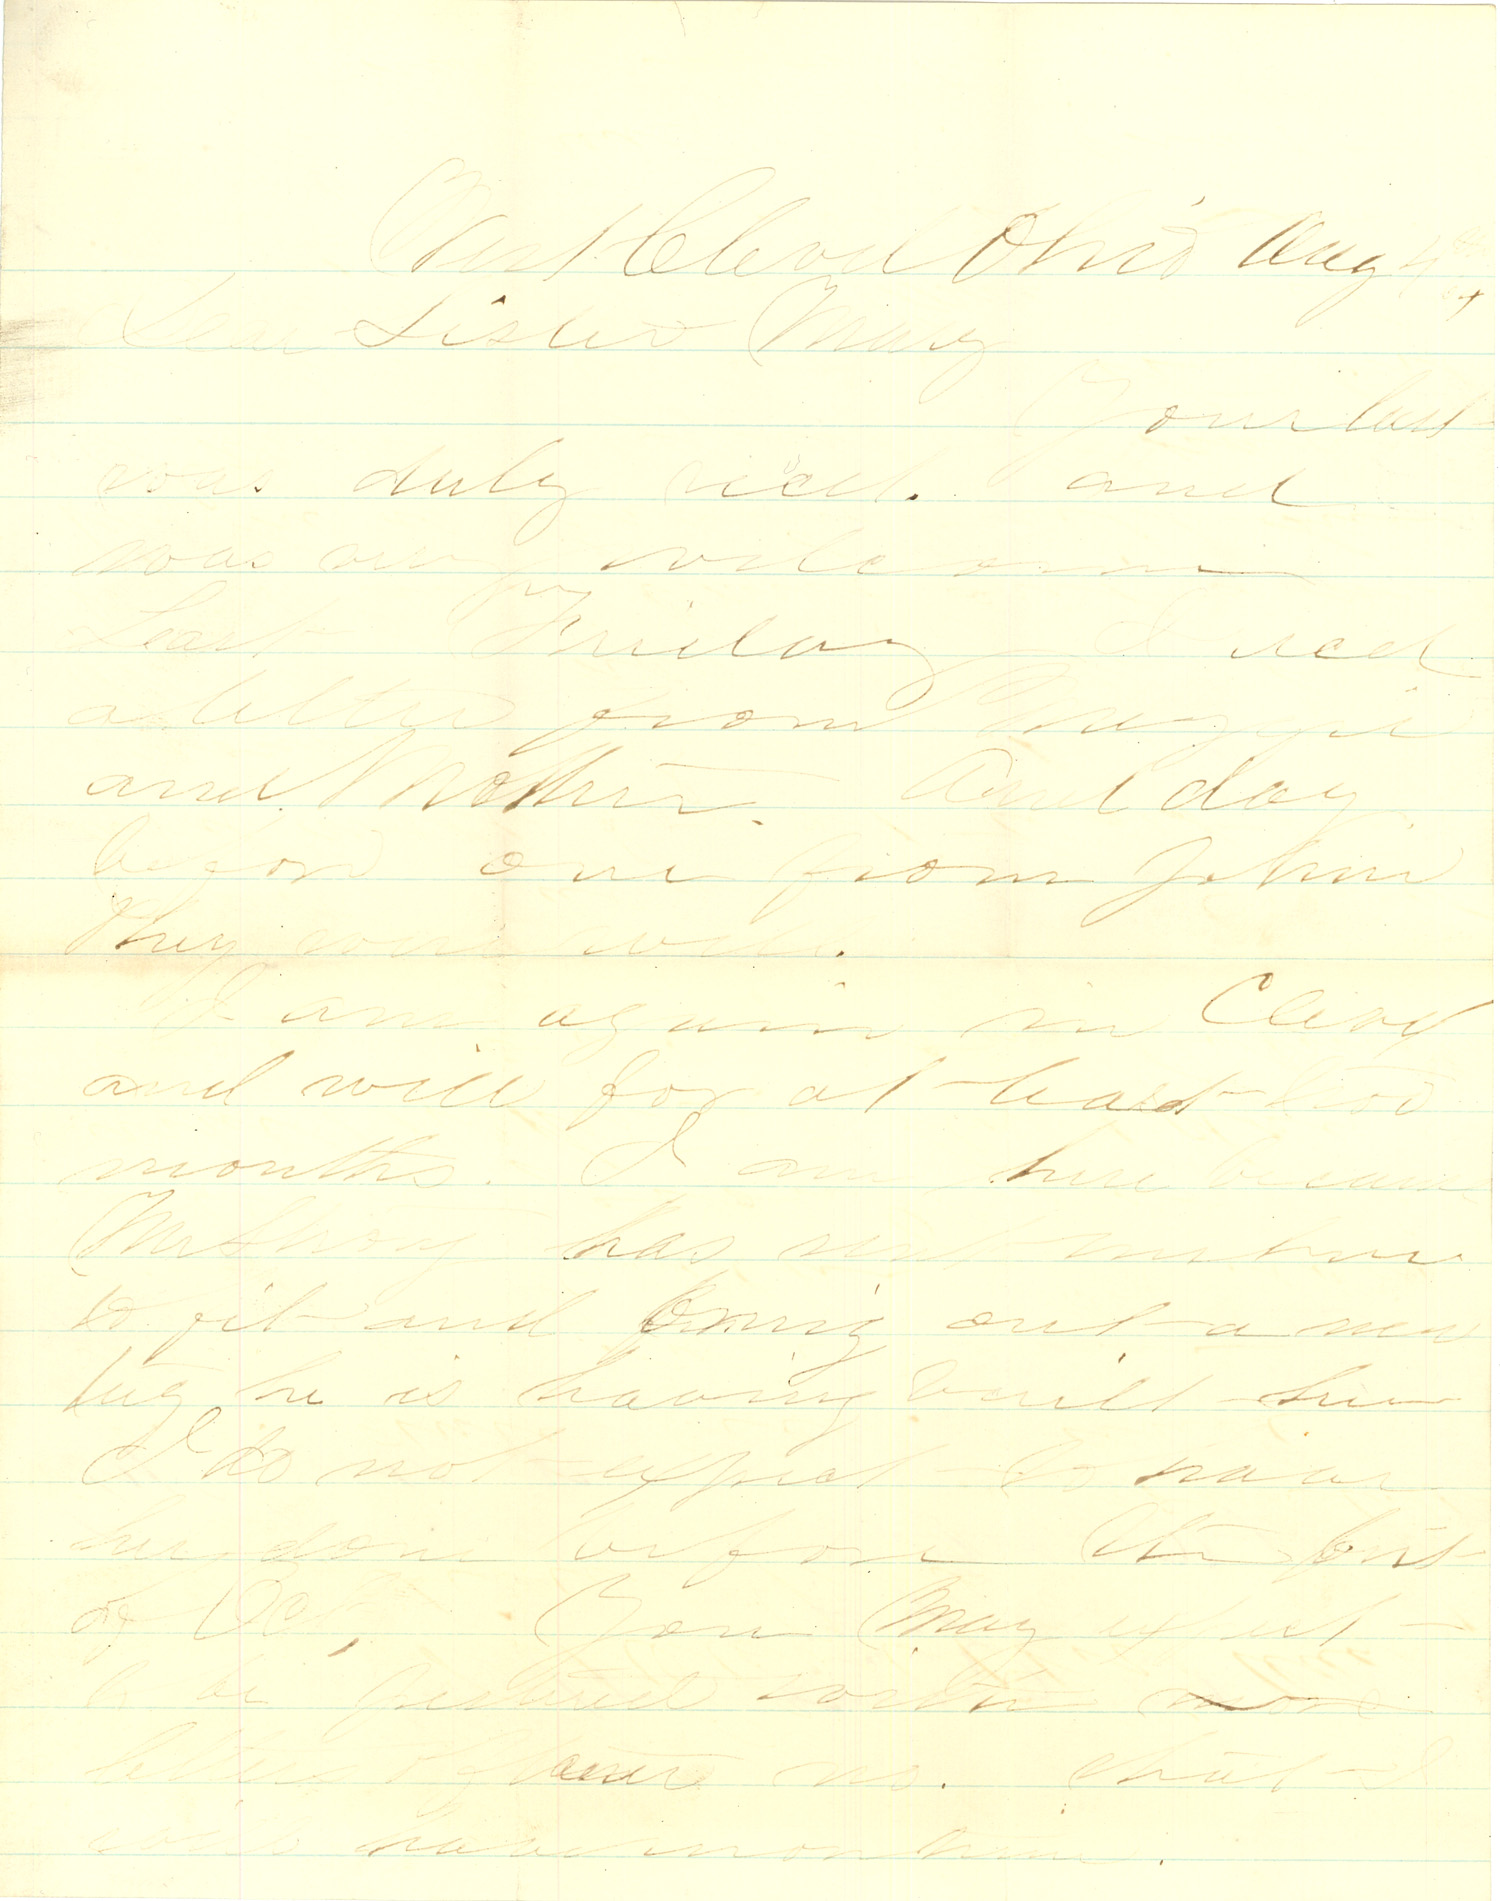 Joseph Culver Letter, August 4, 1864, Page 1